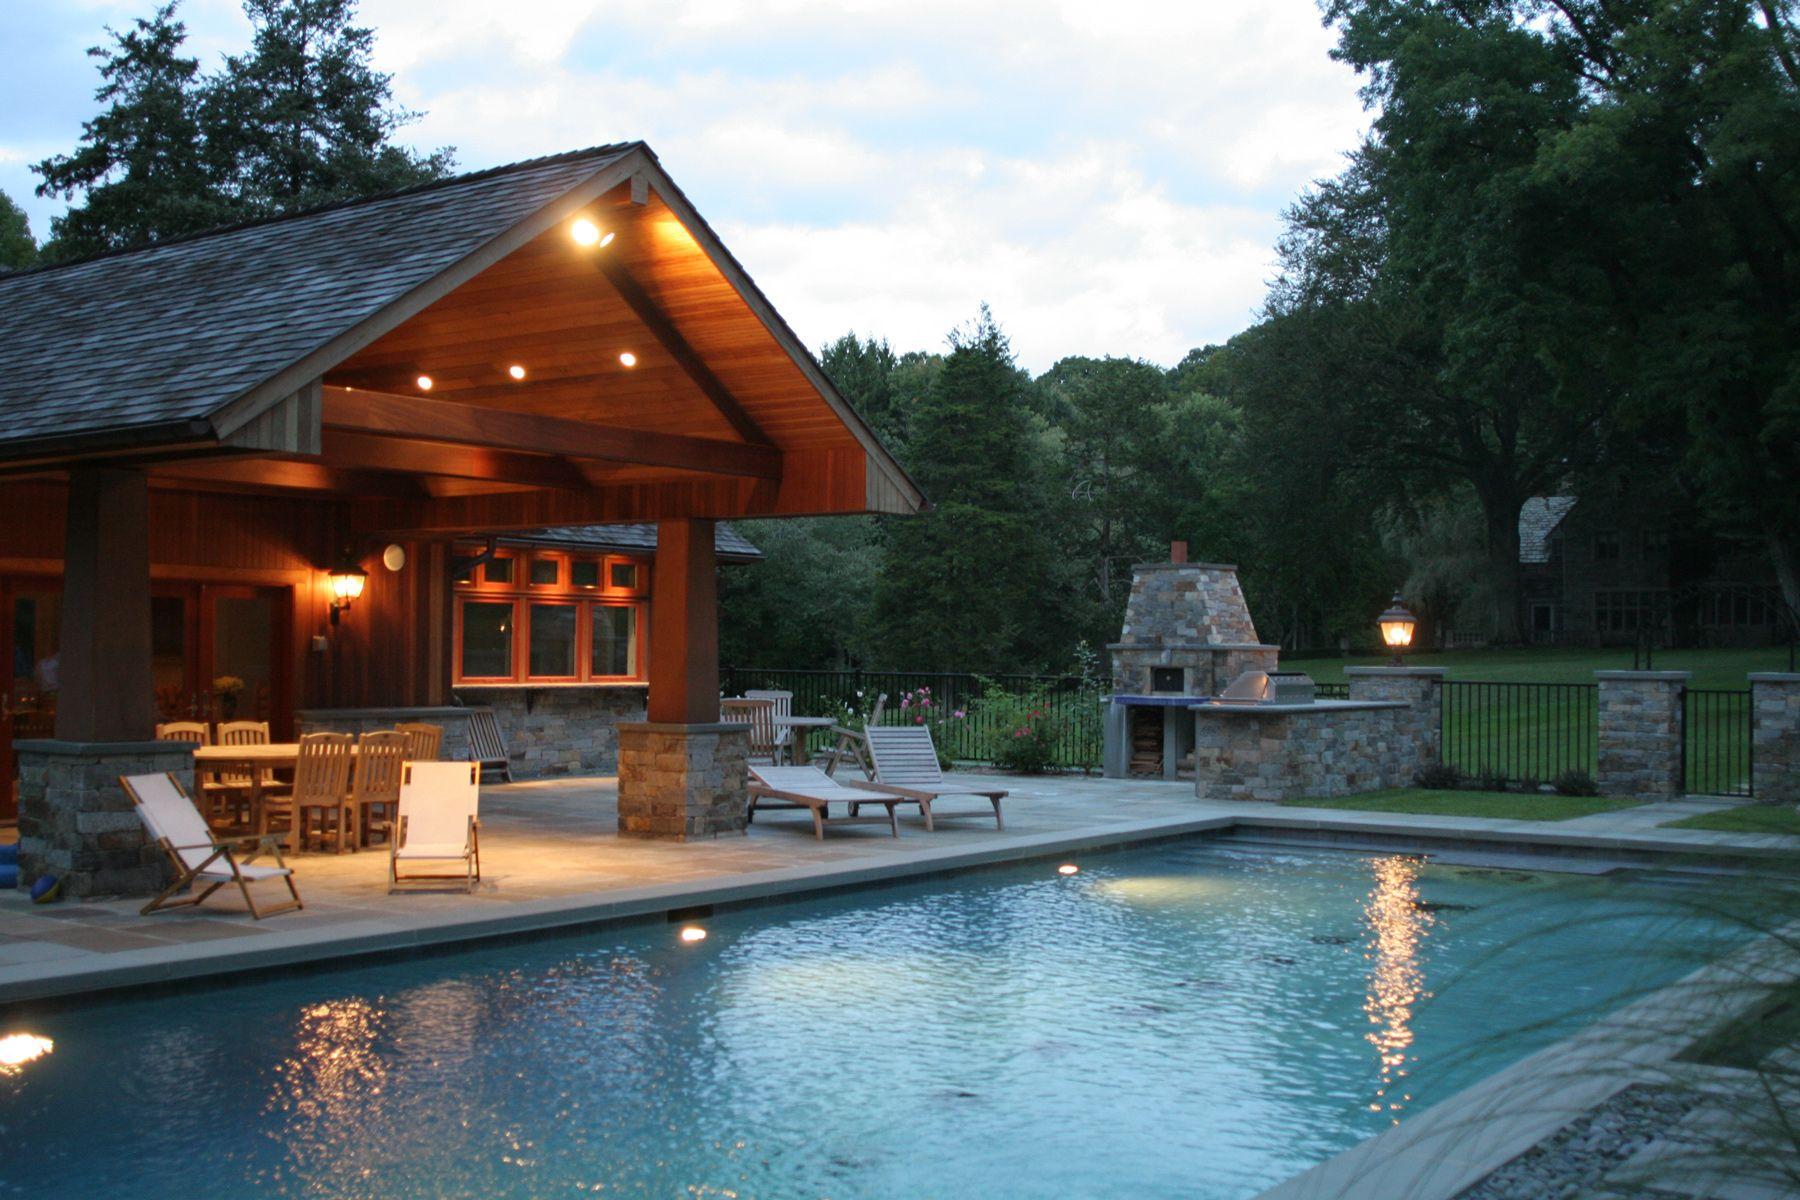 House Plan Cabana No 1911 Pool House Designs Pool House Plans